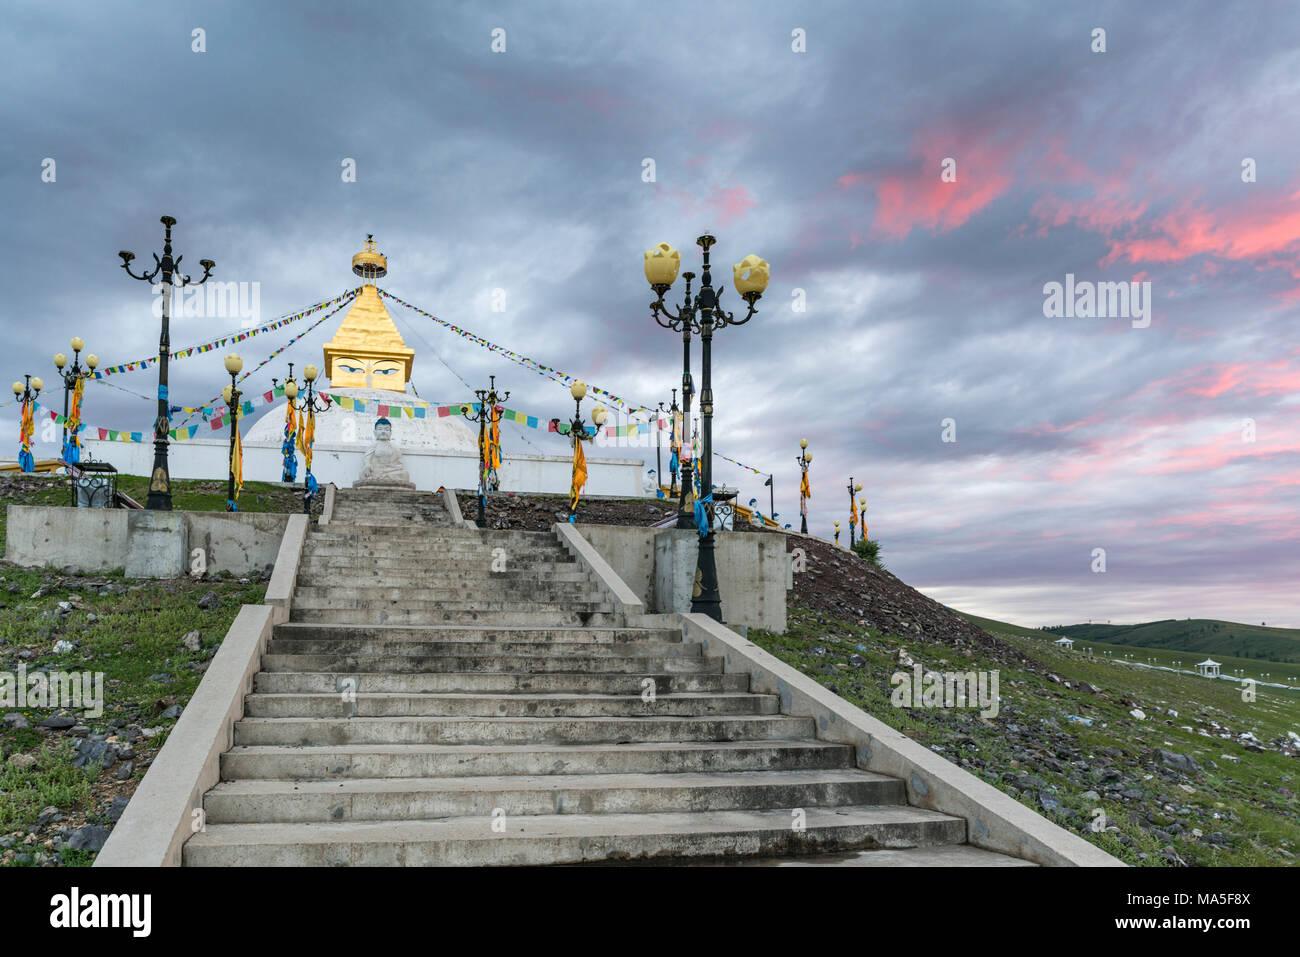 Stairs to the Ovoo above Amarbayasgalant Monastery at sunset. Mount Buren-Khaan, Baruunburen district, Selenge province, Mongolia. Stock Photo